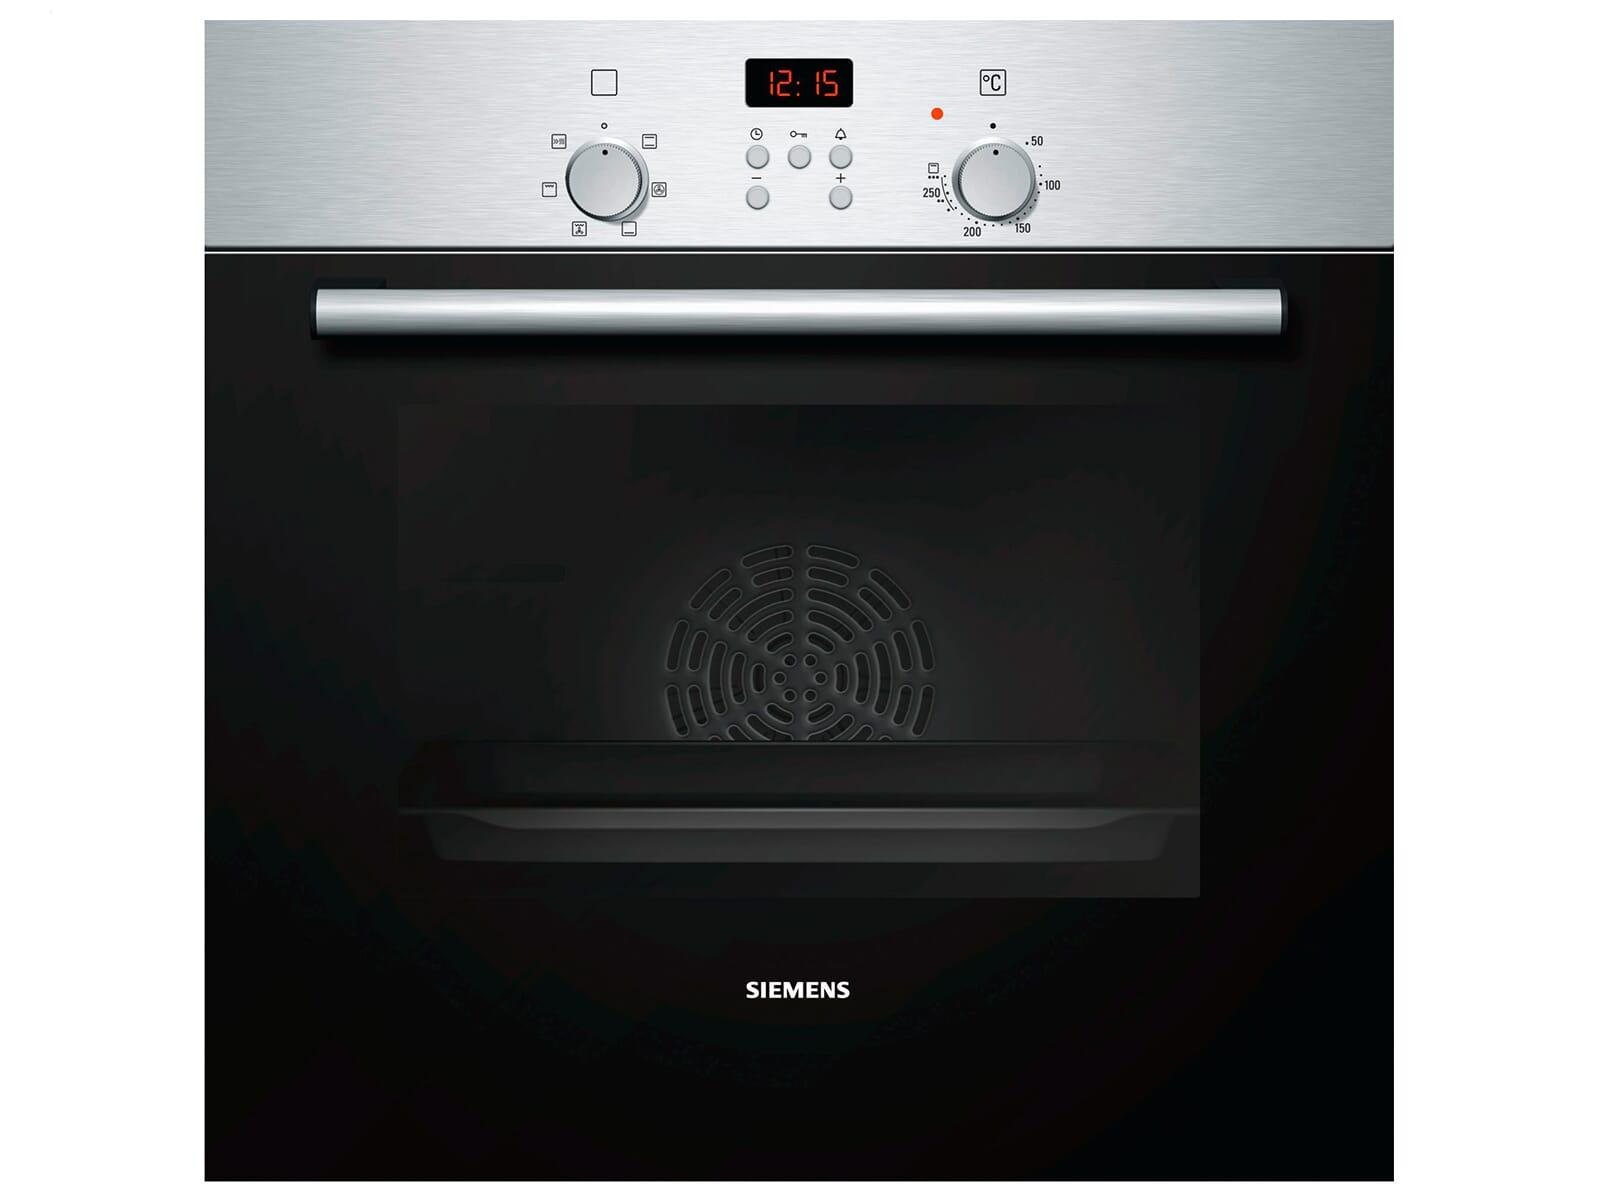 Kühlschrank Unterbau : Kühlschrank unterbau kühlschrank unterbau a preisvergleich